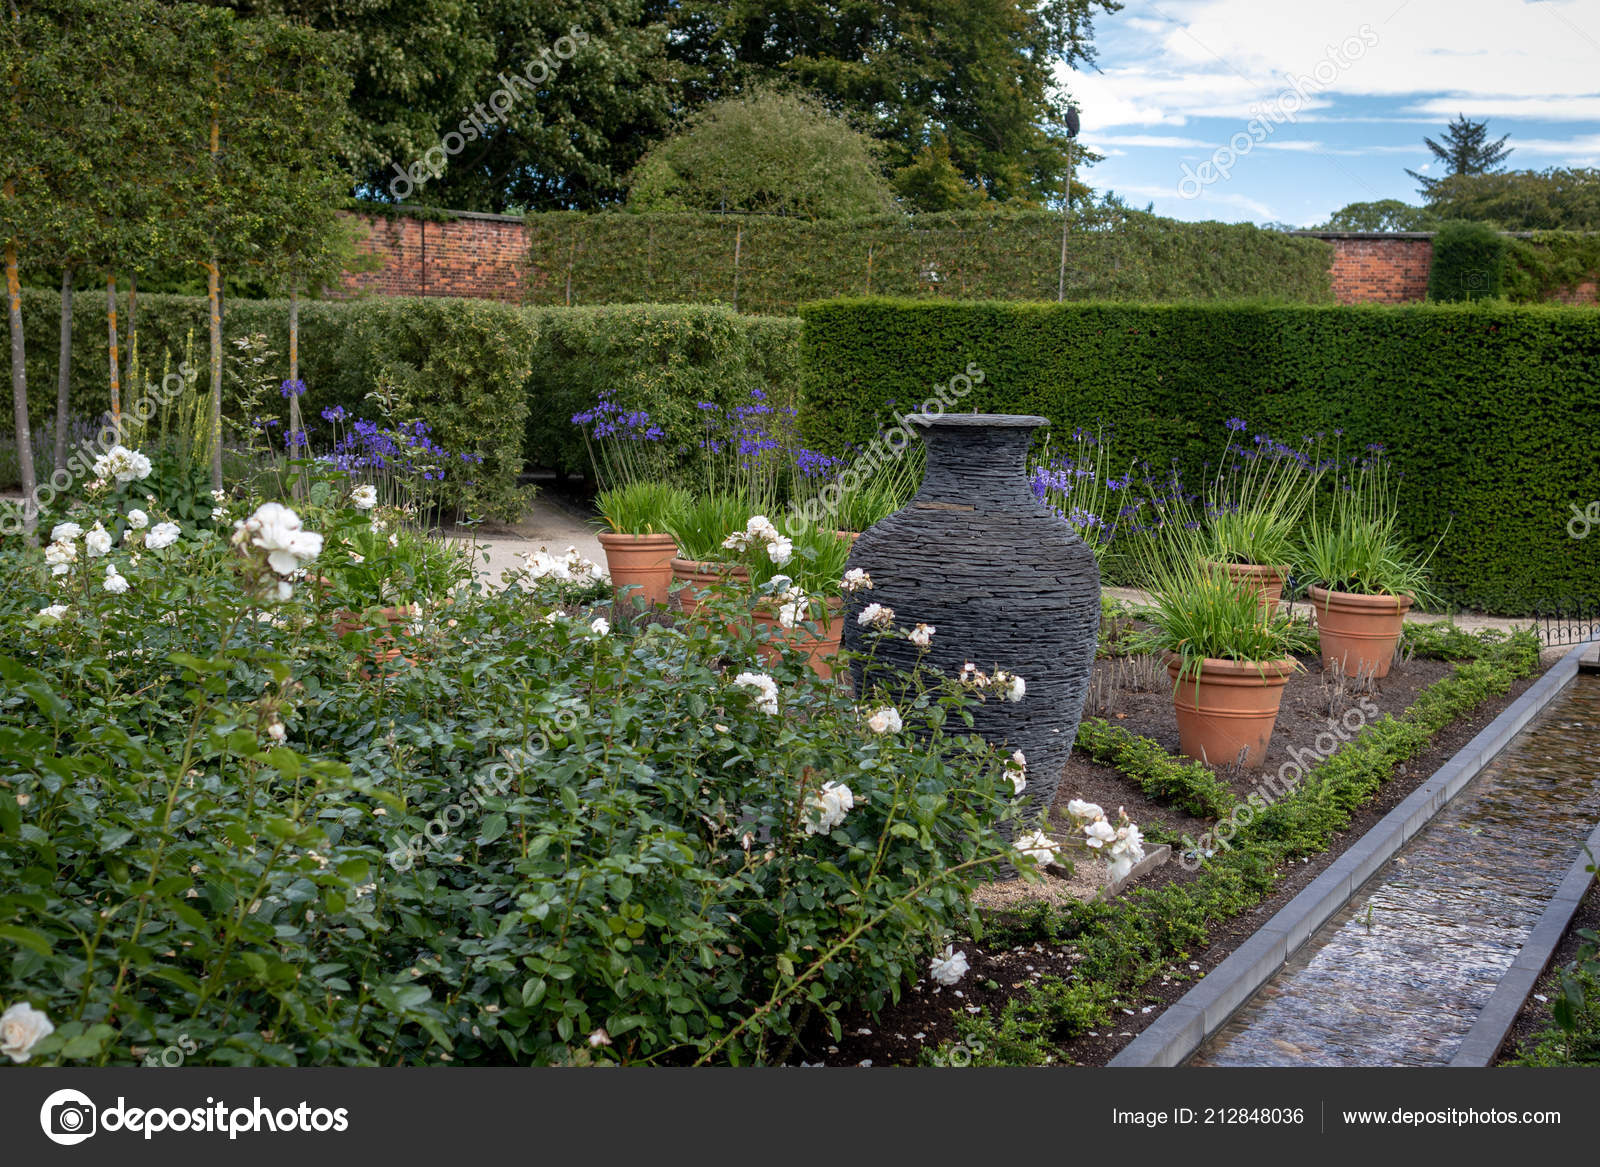 Alnwick Northumberland Juillet 2018 Jardin Ornement Dans Les Jardins ...